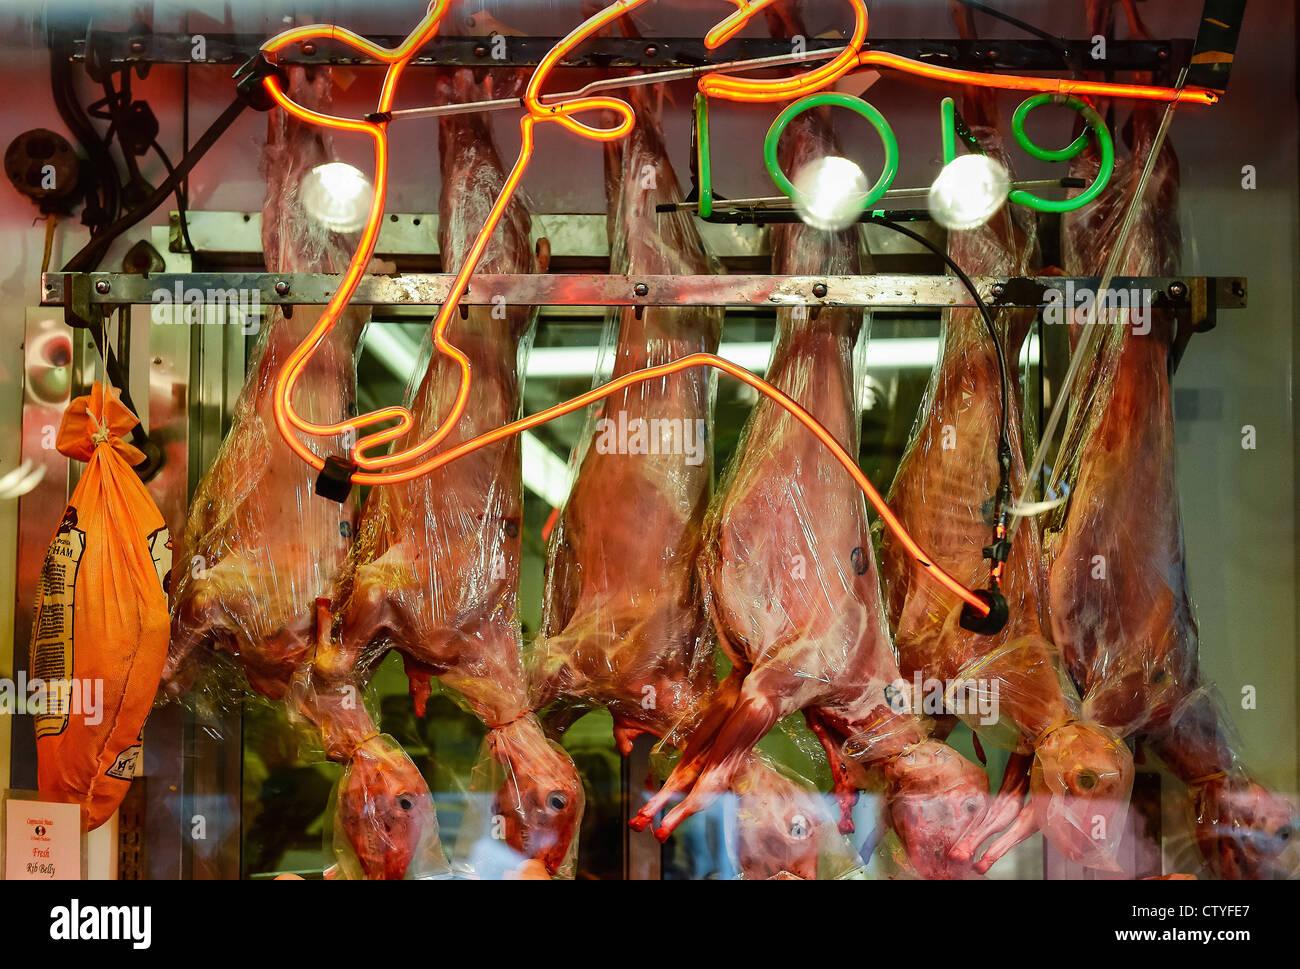 Online butcher shop usa